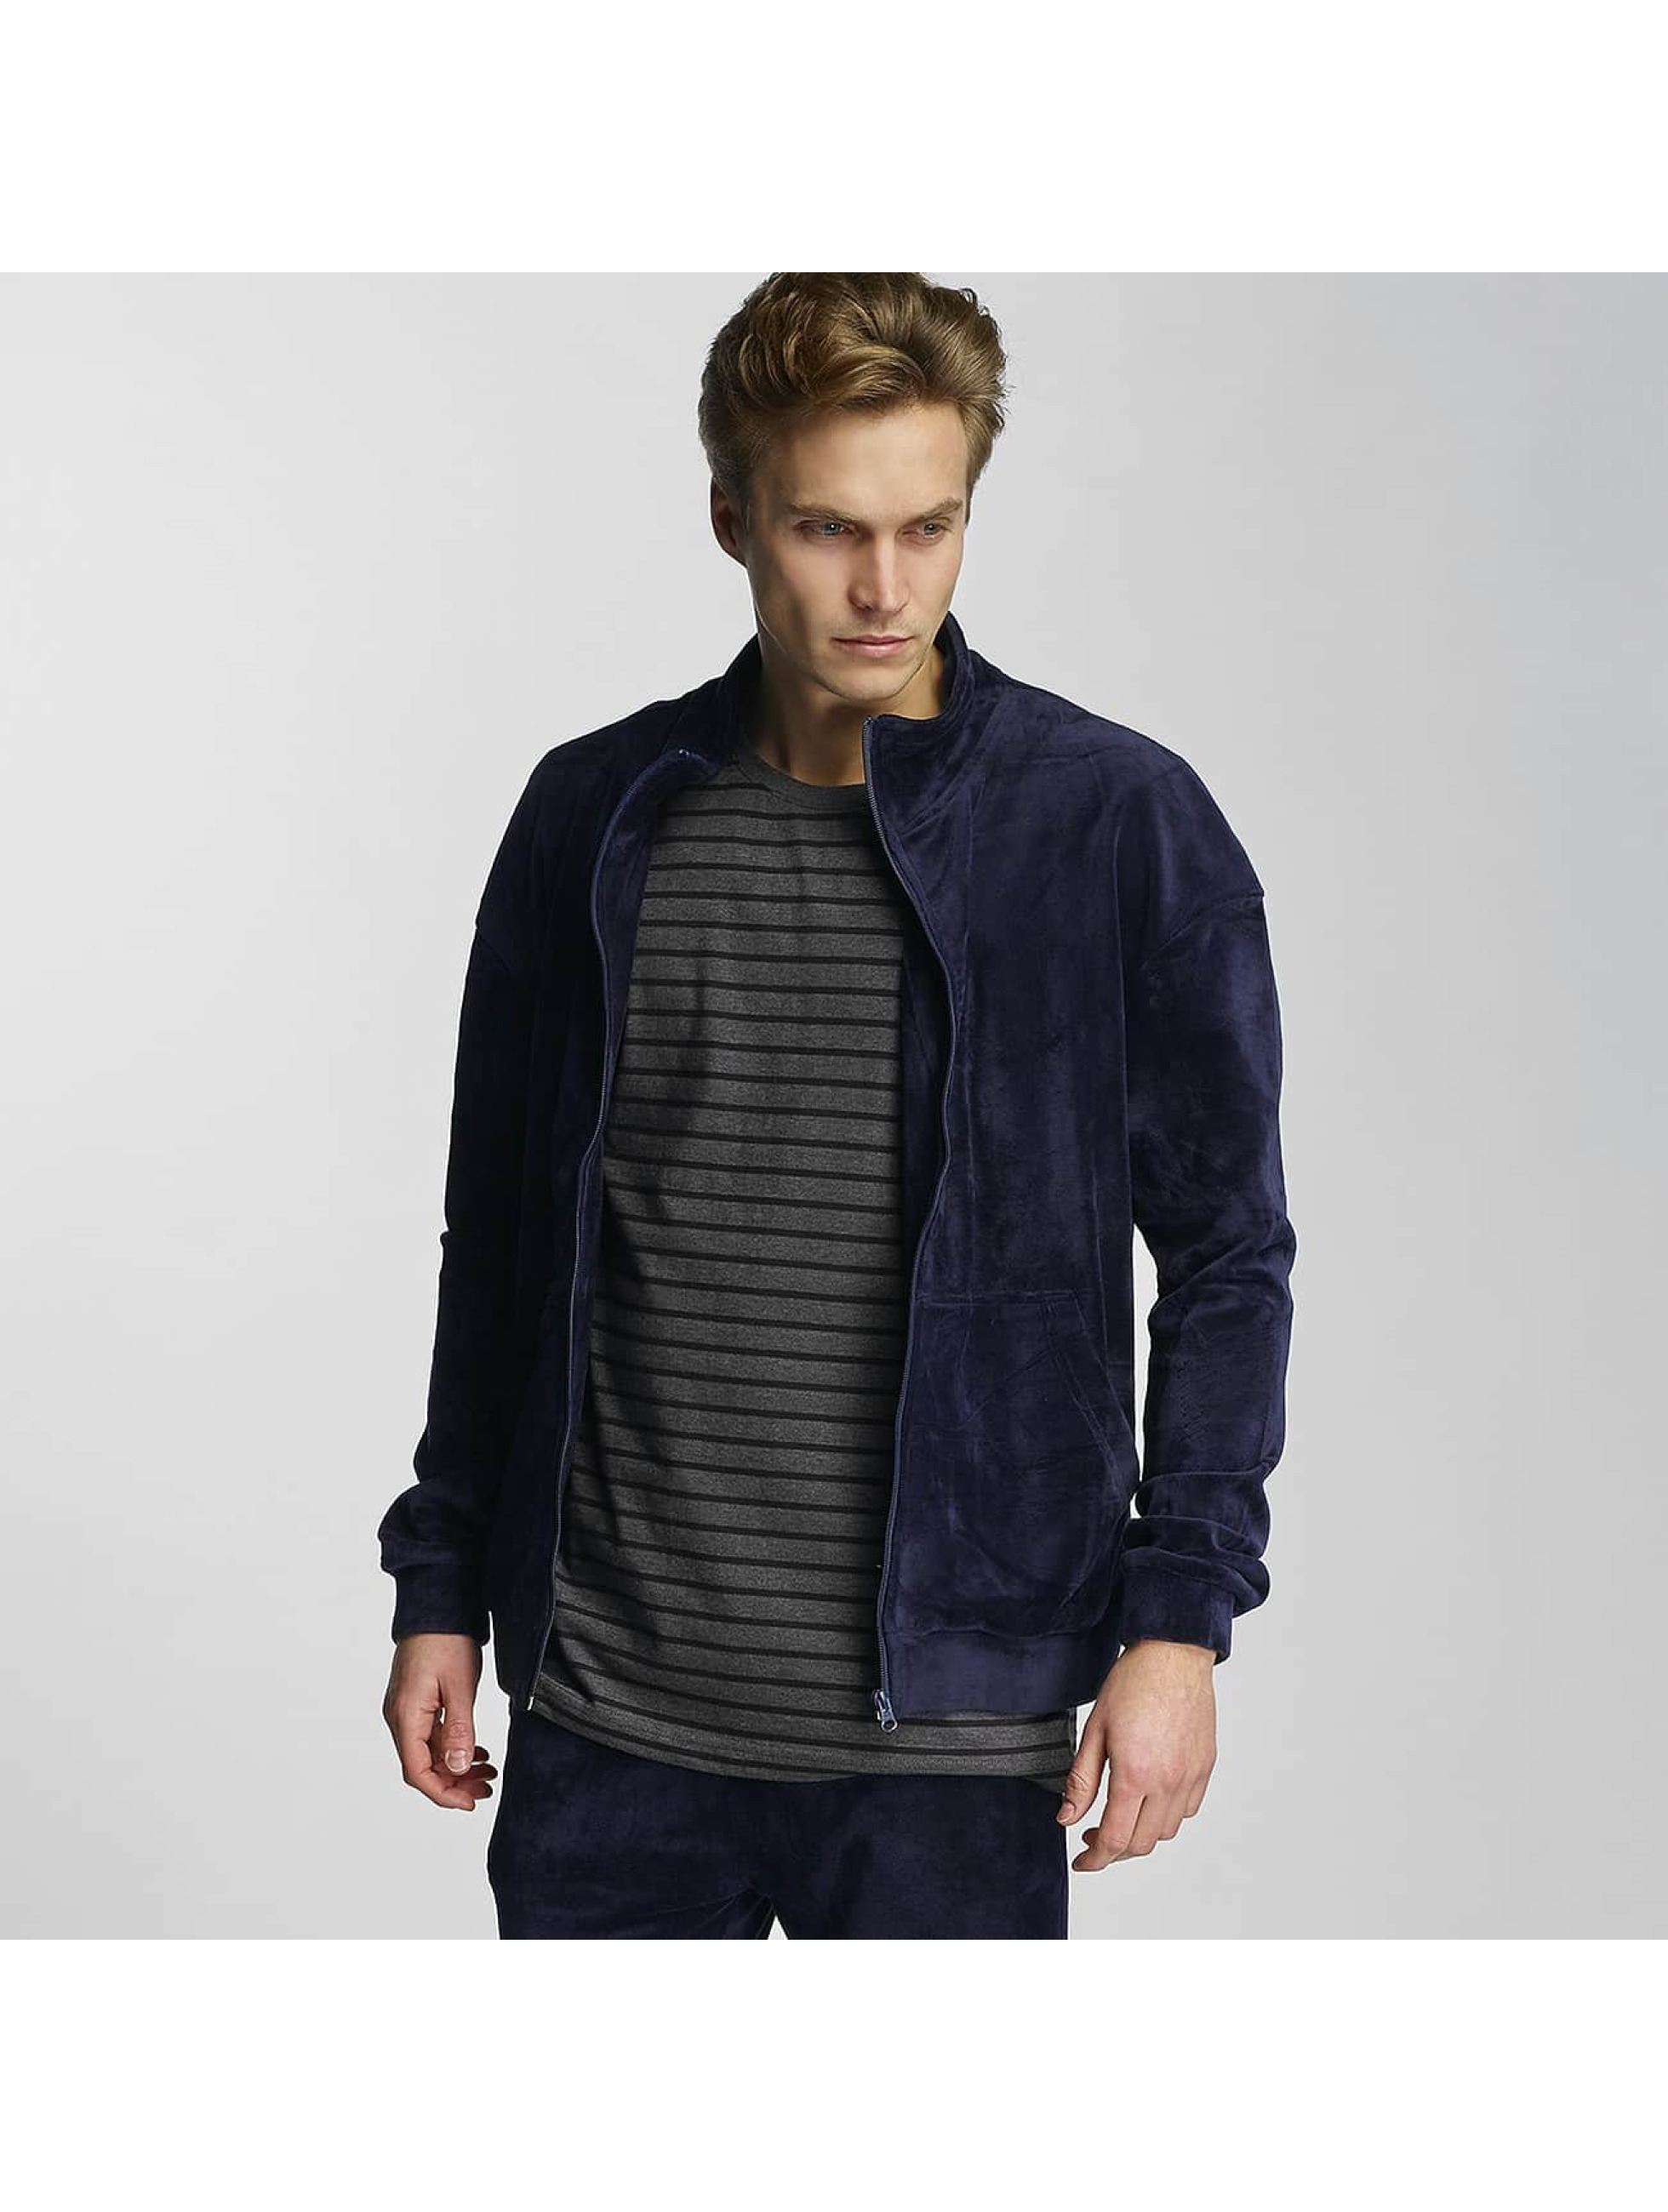 Urban Classics heren zomerjas Velvet - blauw